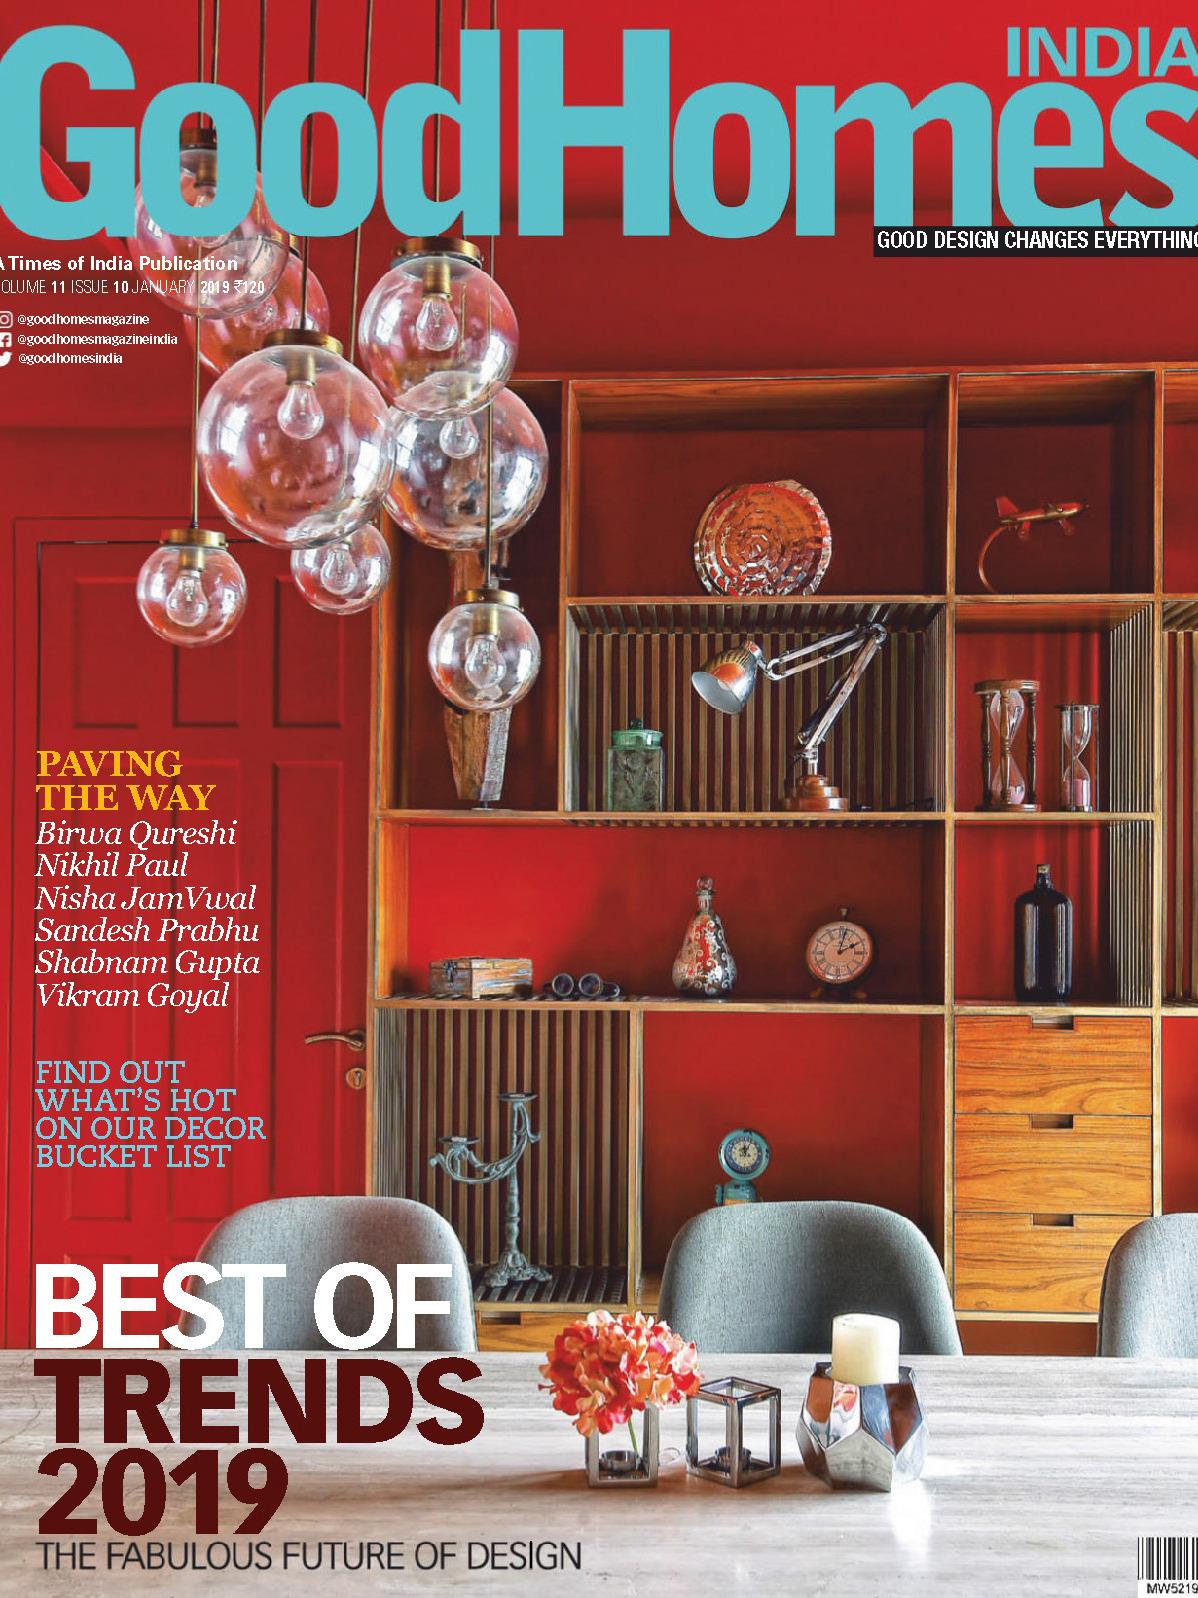 《Good Homes》印度版居家室内设计杂志2019年01月号